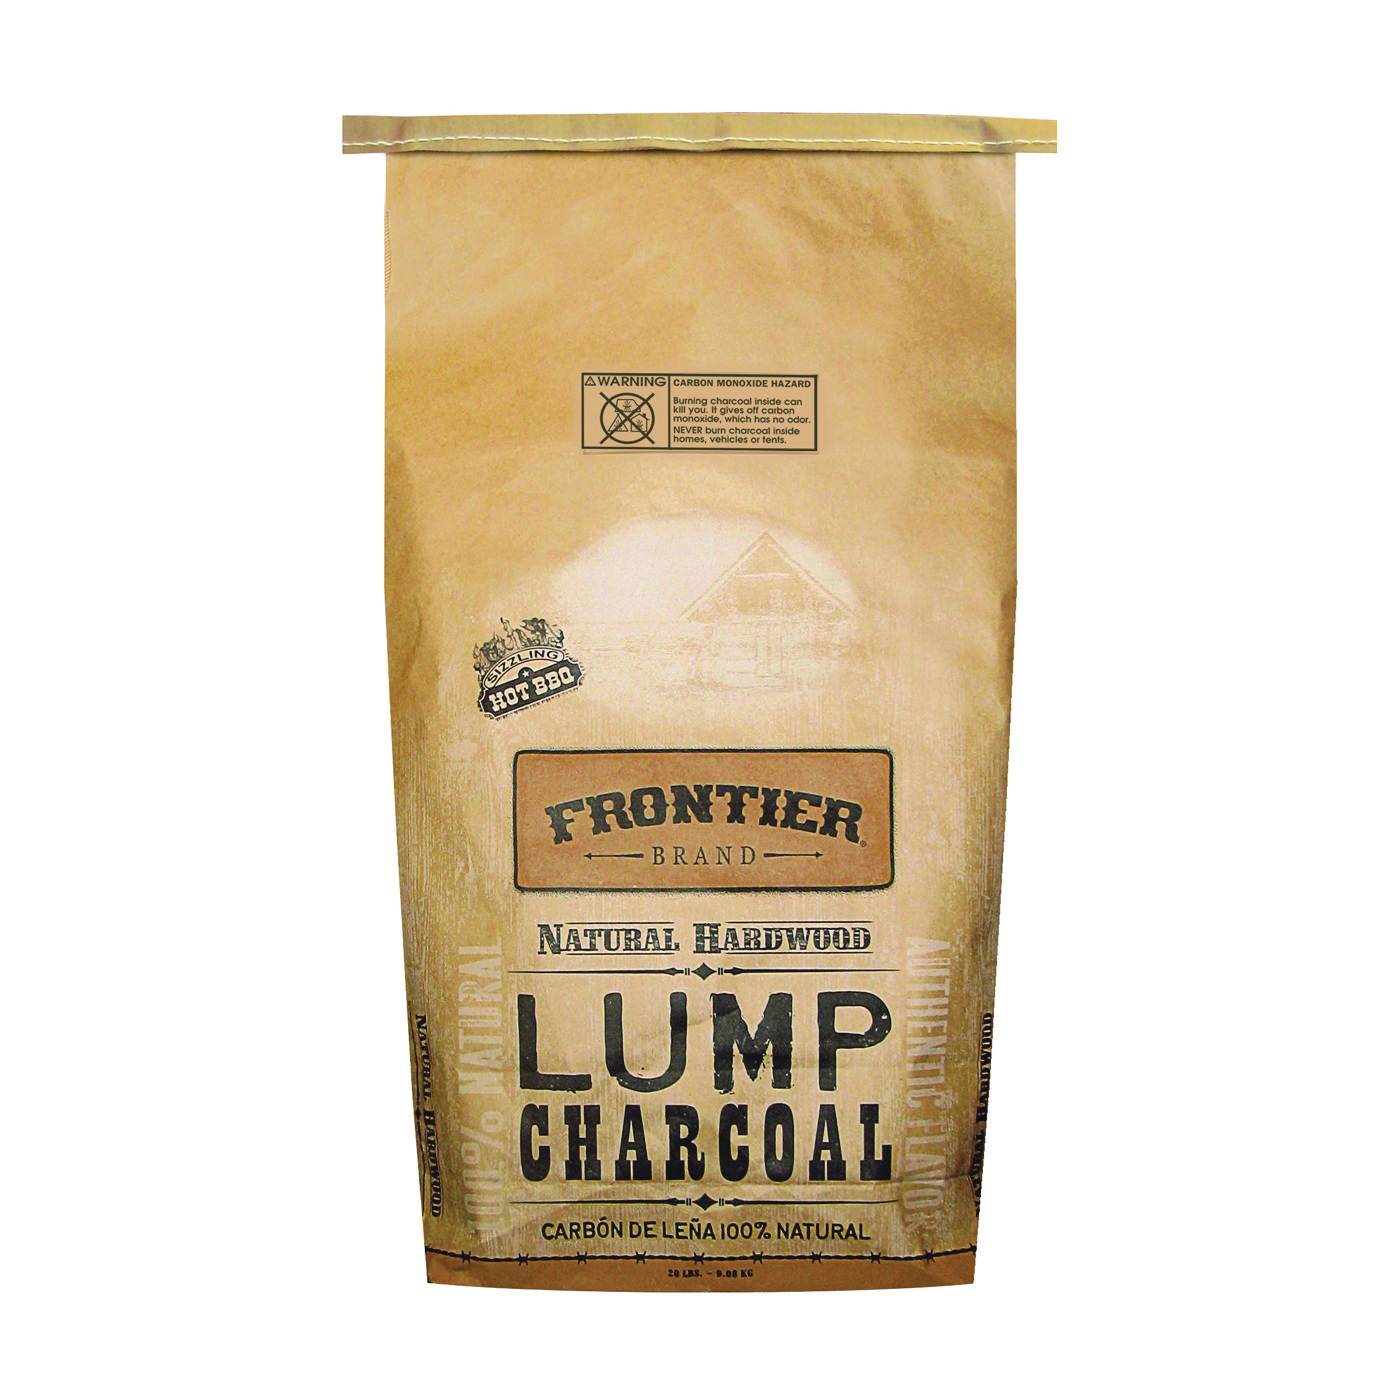 Picture of ROYAL OAK LCID20 Lump Charcoal, 20 lb Package, Bag